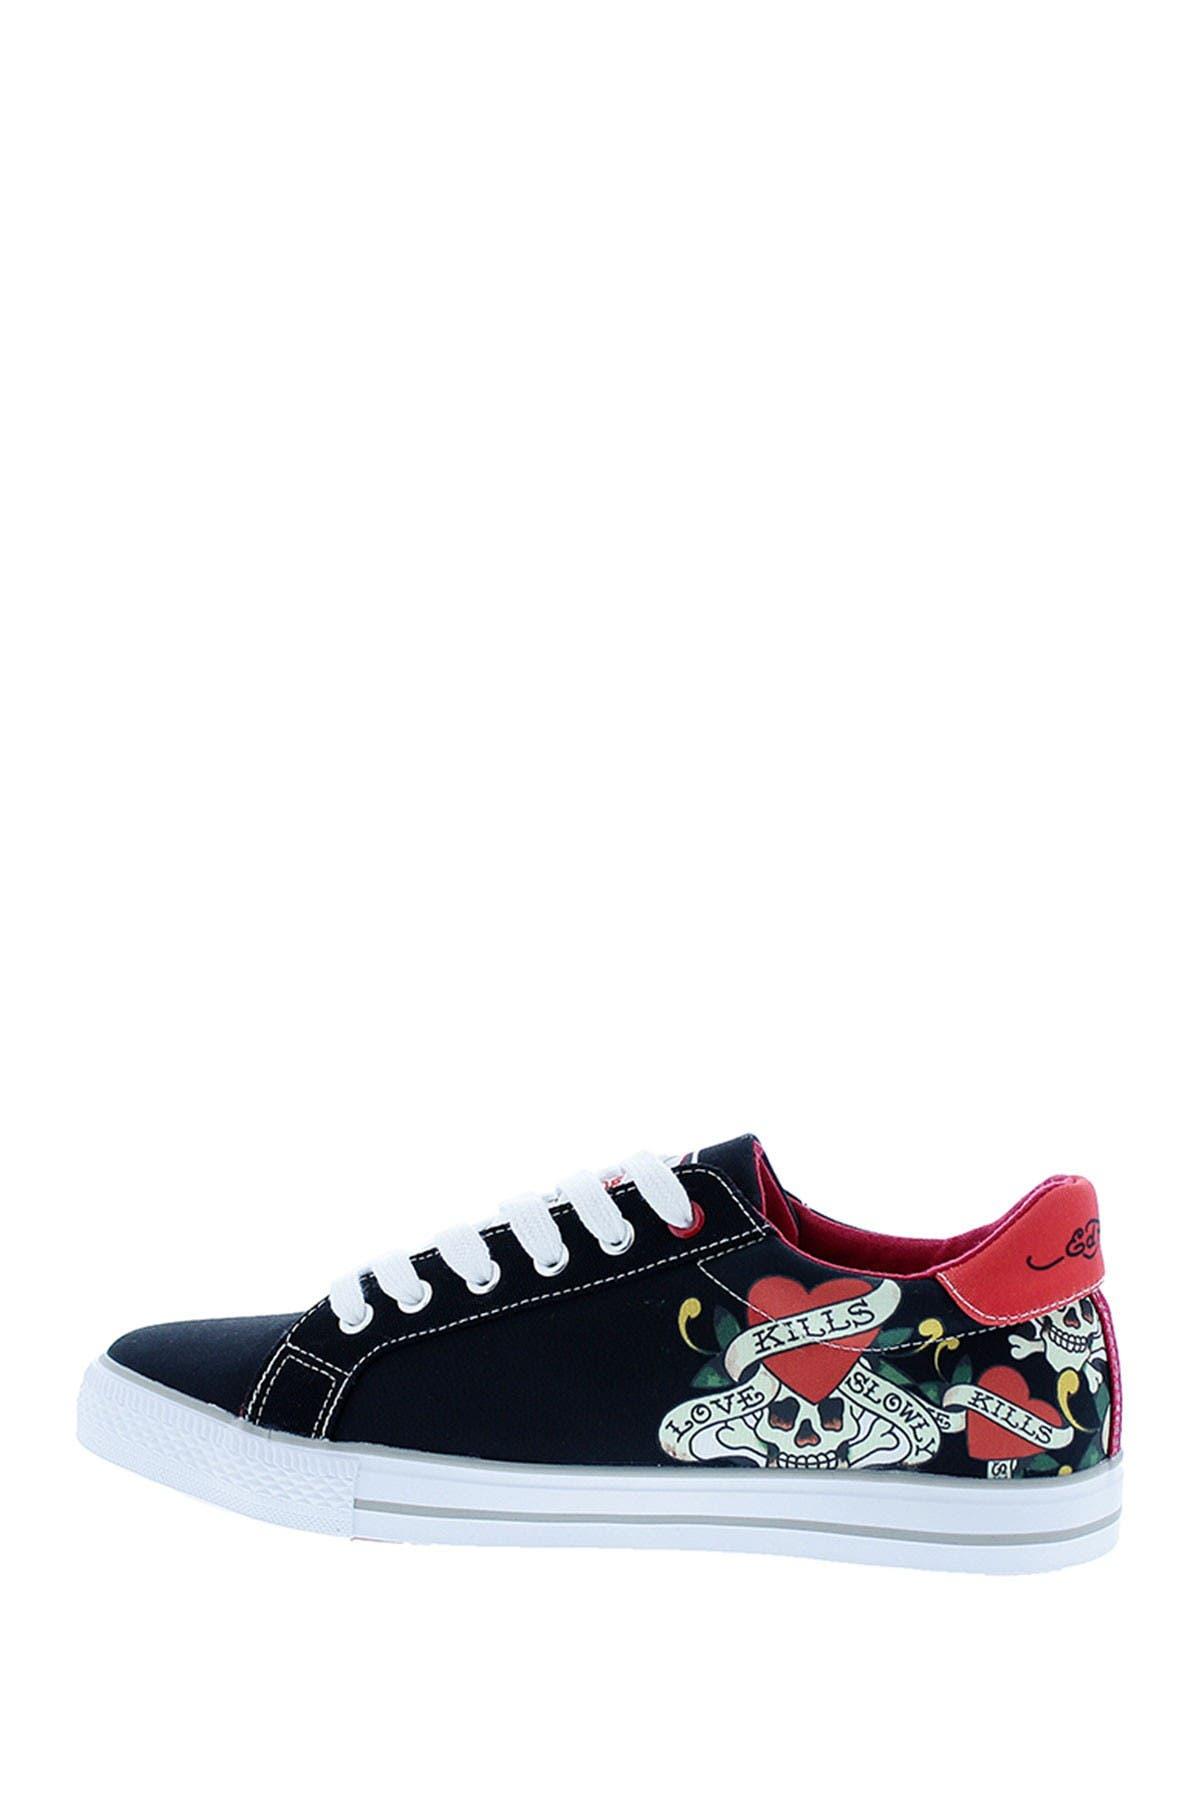 Image of Ed Hardy Thread Sneaker